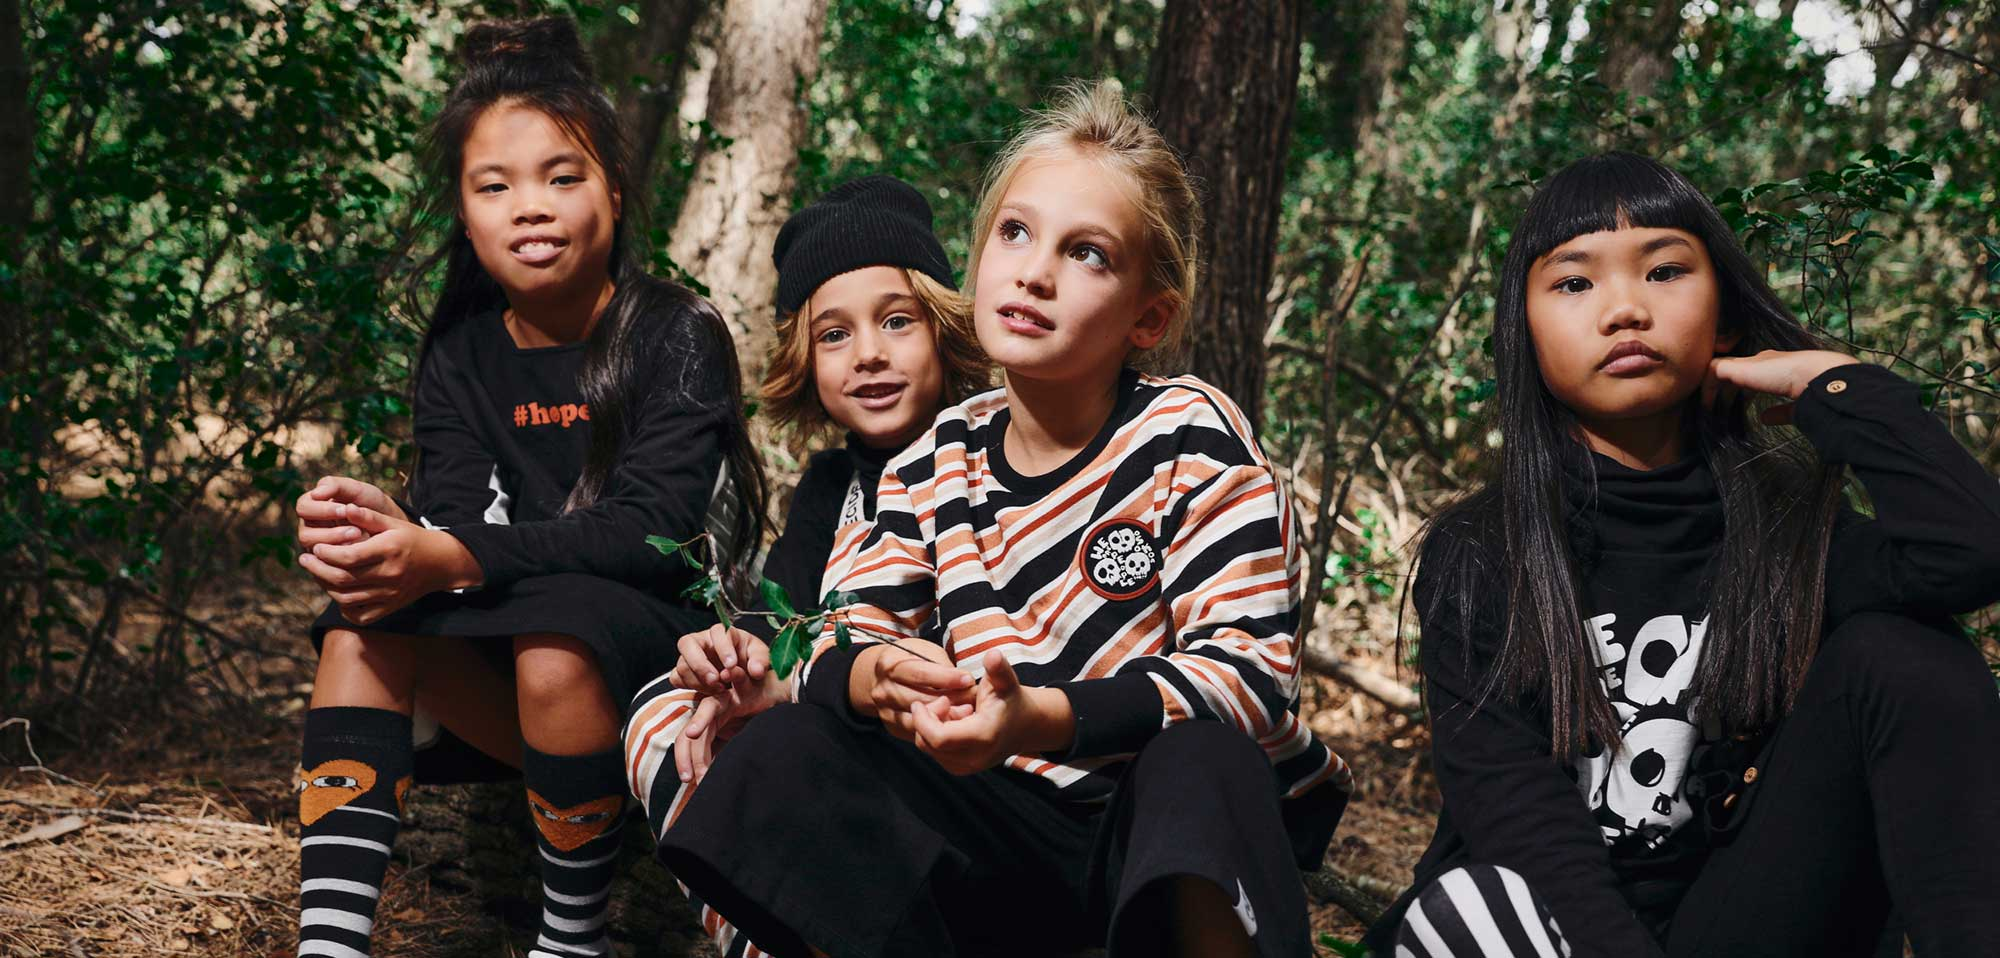 Osokoa - Sustainable Fashion for Kids